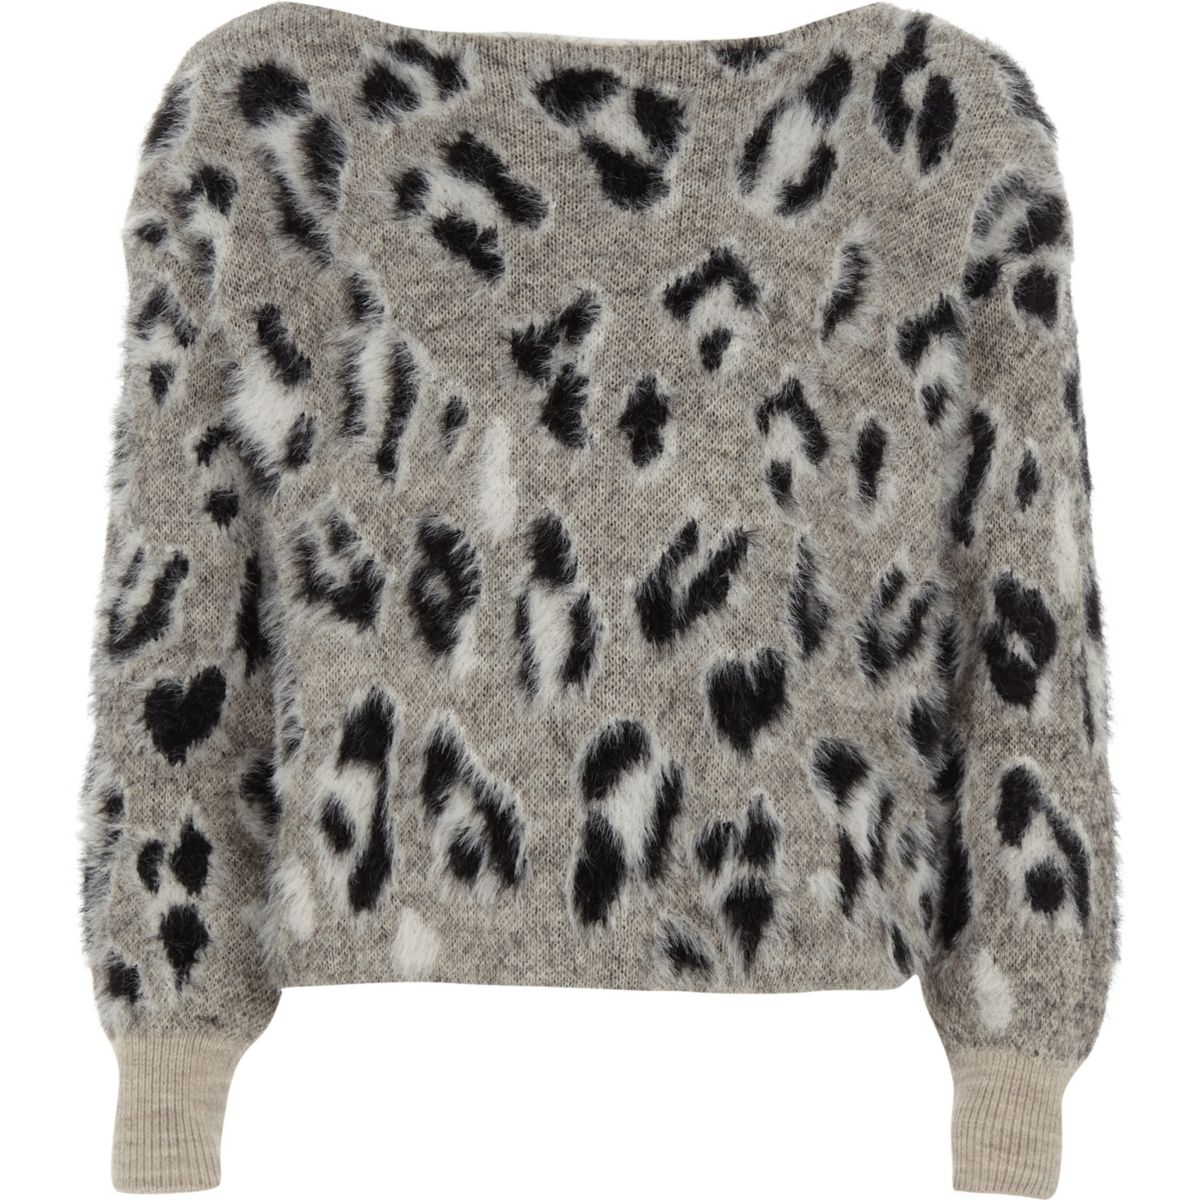 Girls grey leopard print fluffly jumper